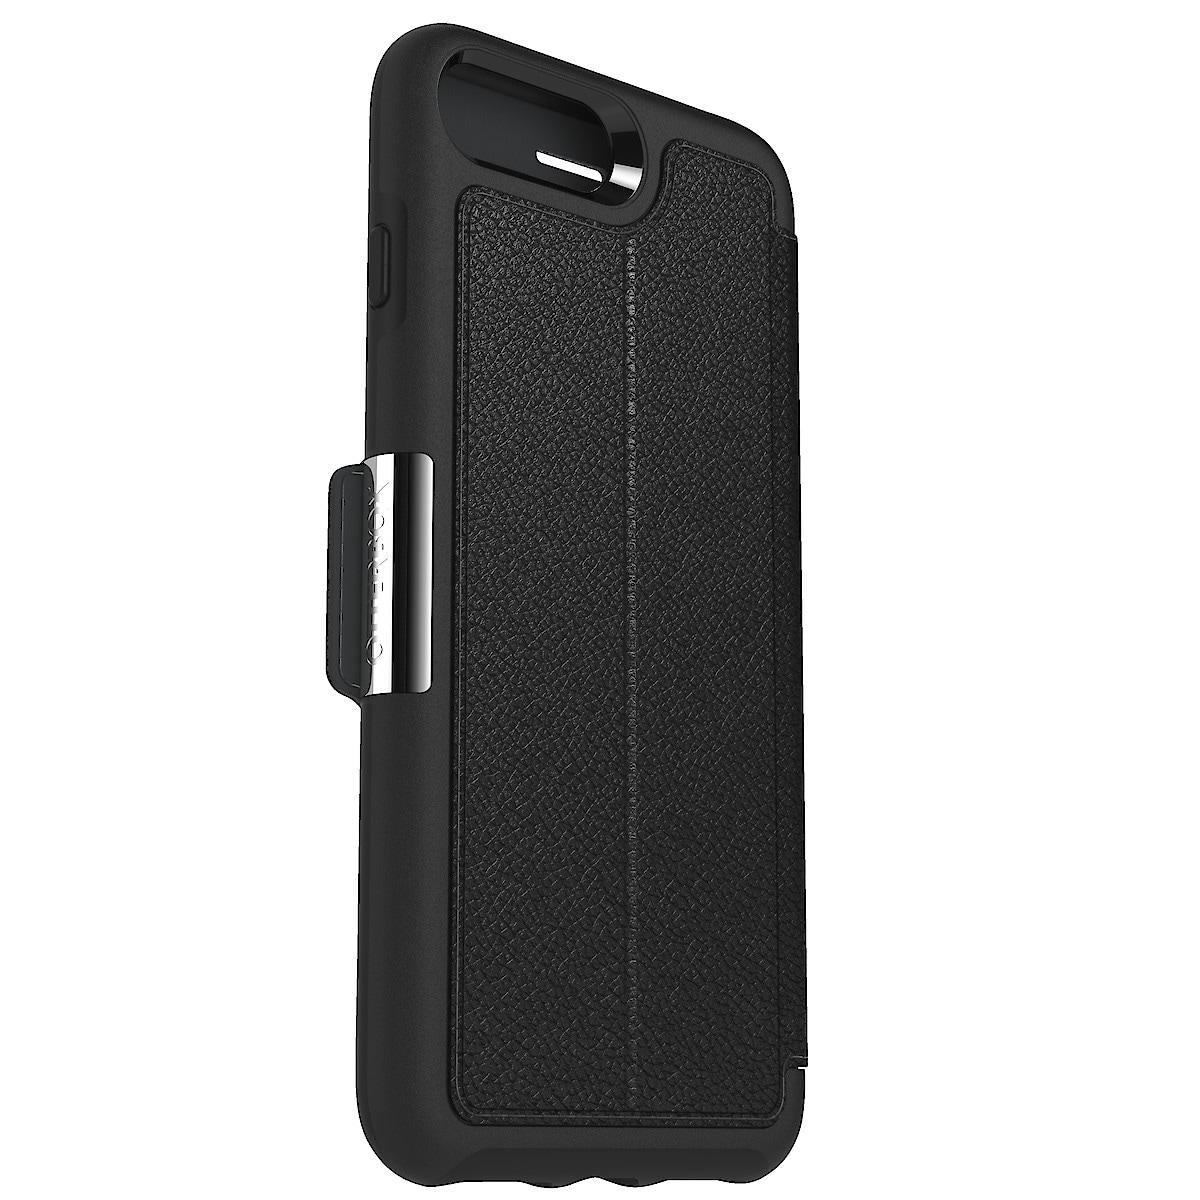 Skyddsskal för iPhone 7 Plus Otterbox Strada